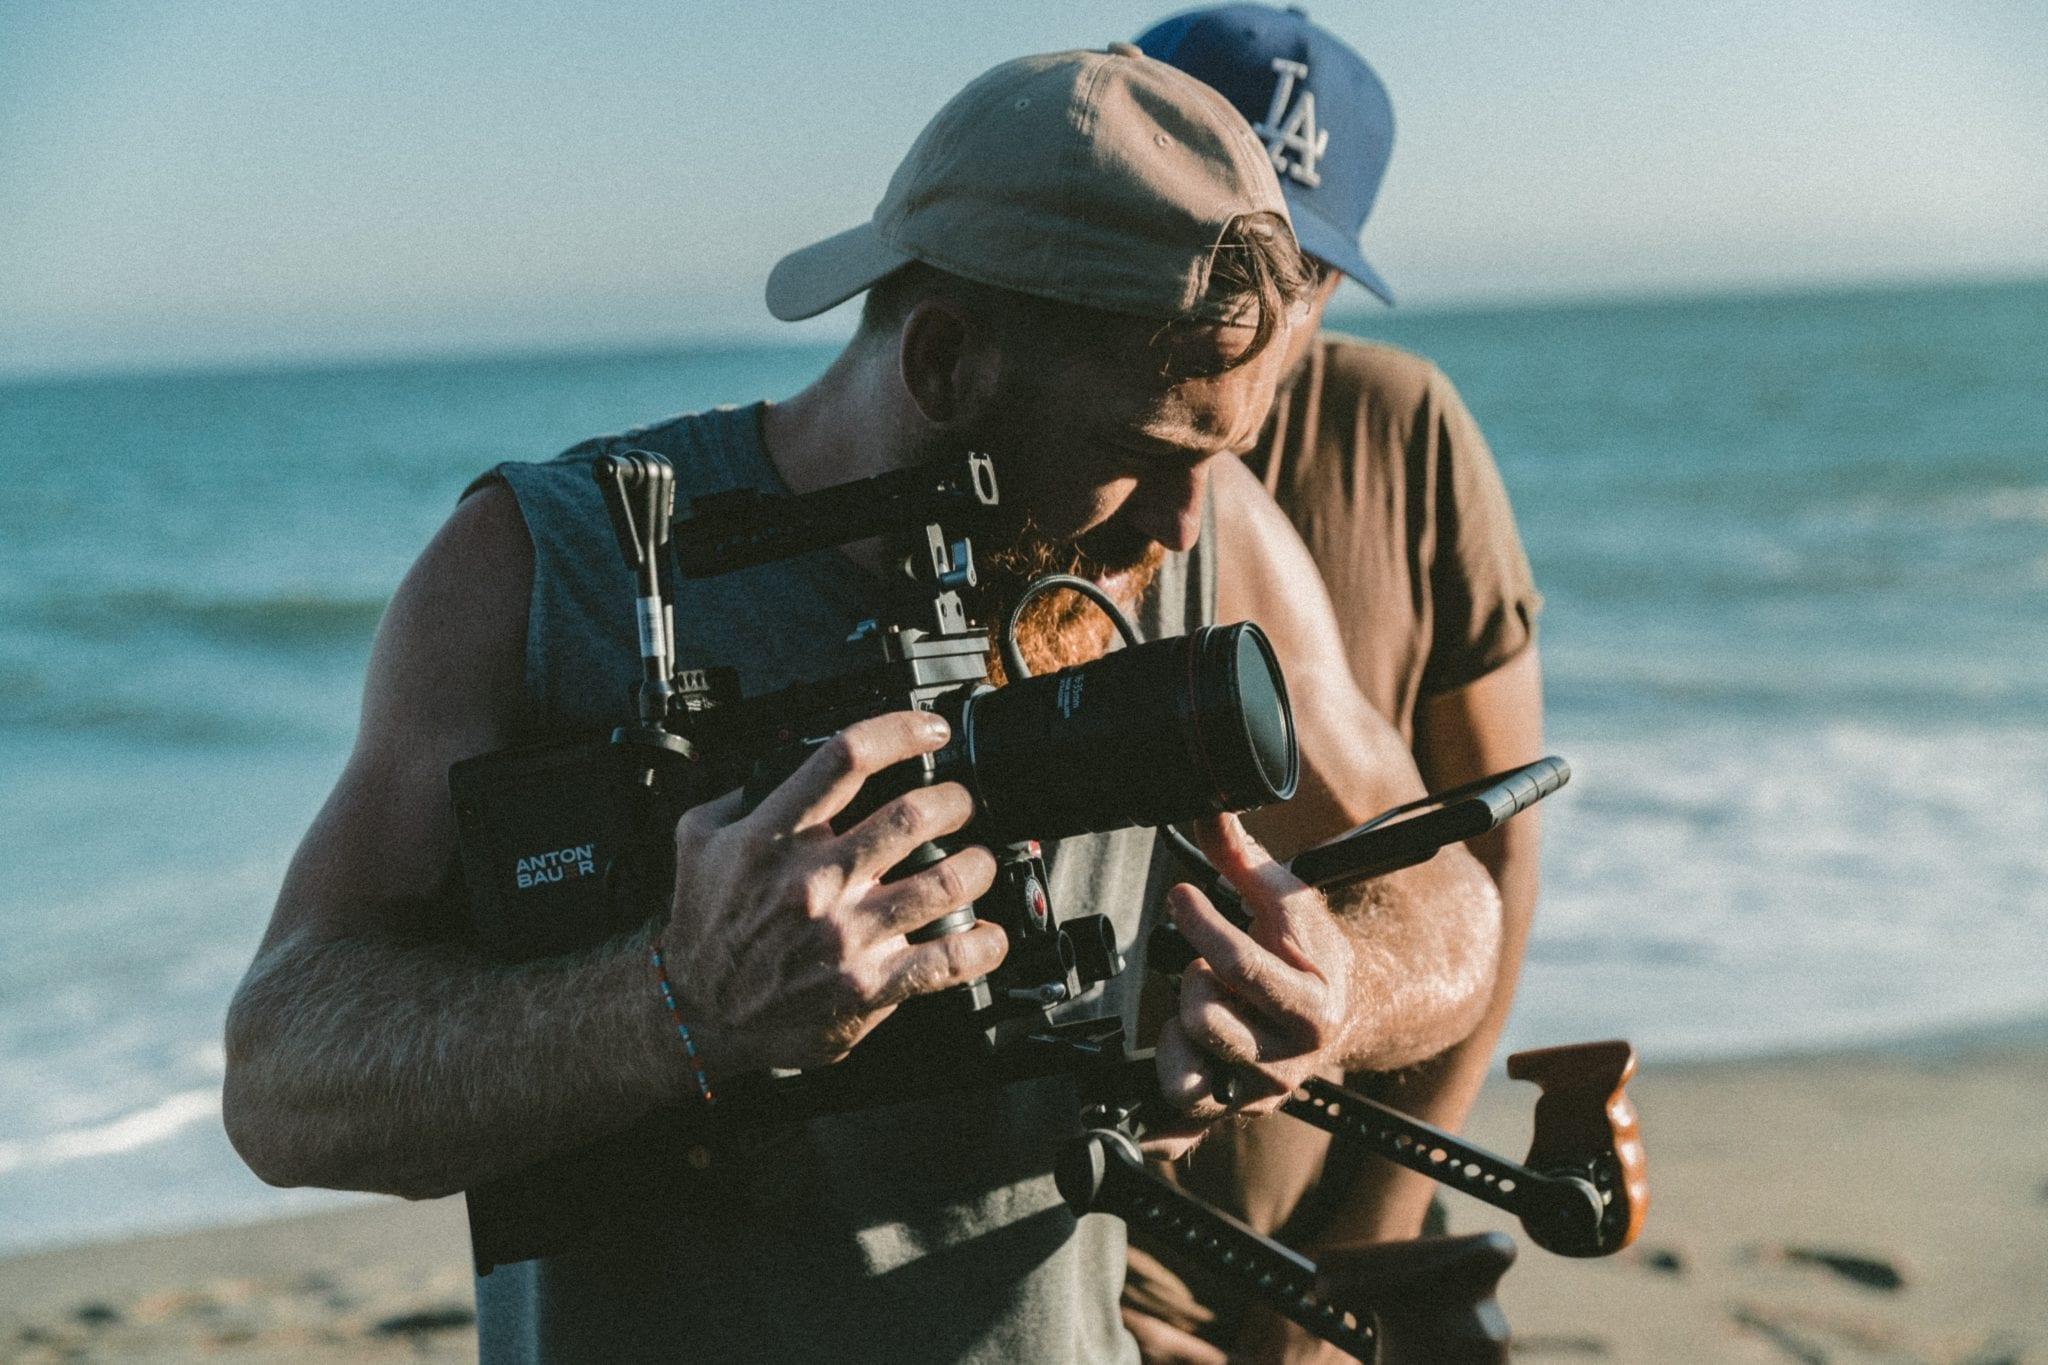 A freelance filmmaker. Start your career in the film industry